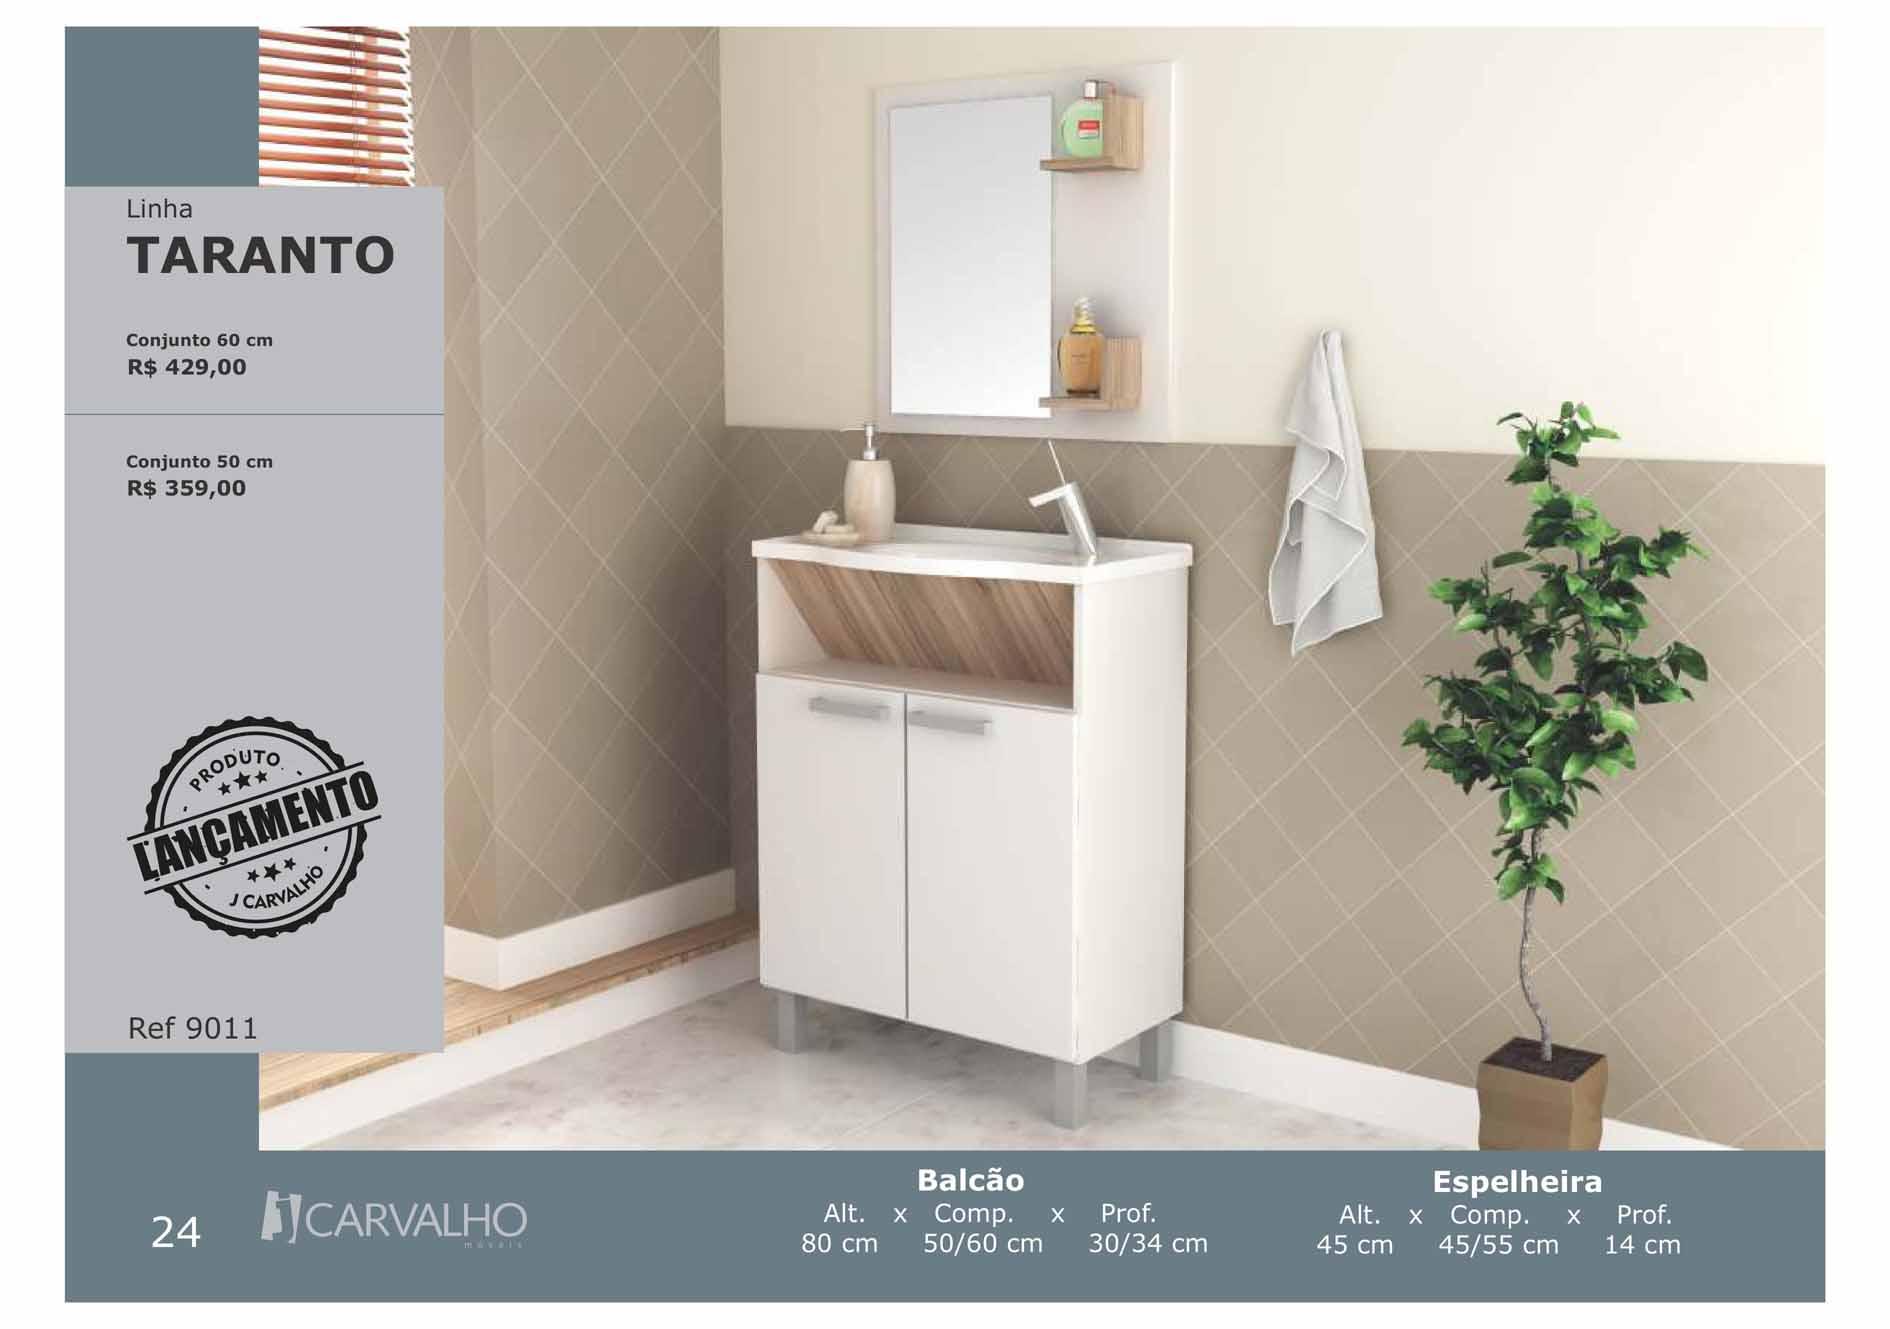 Taranto – Ref 9011